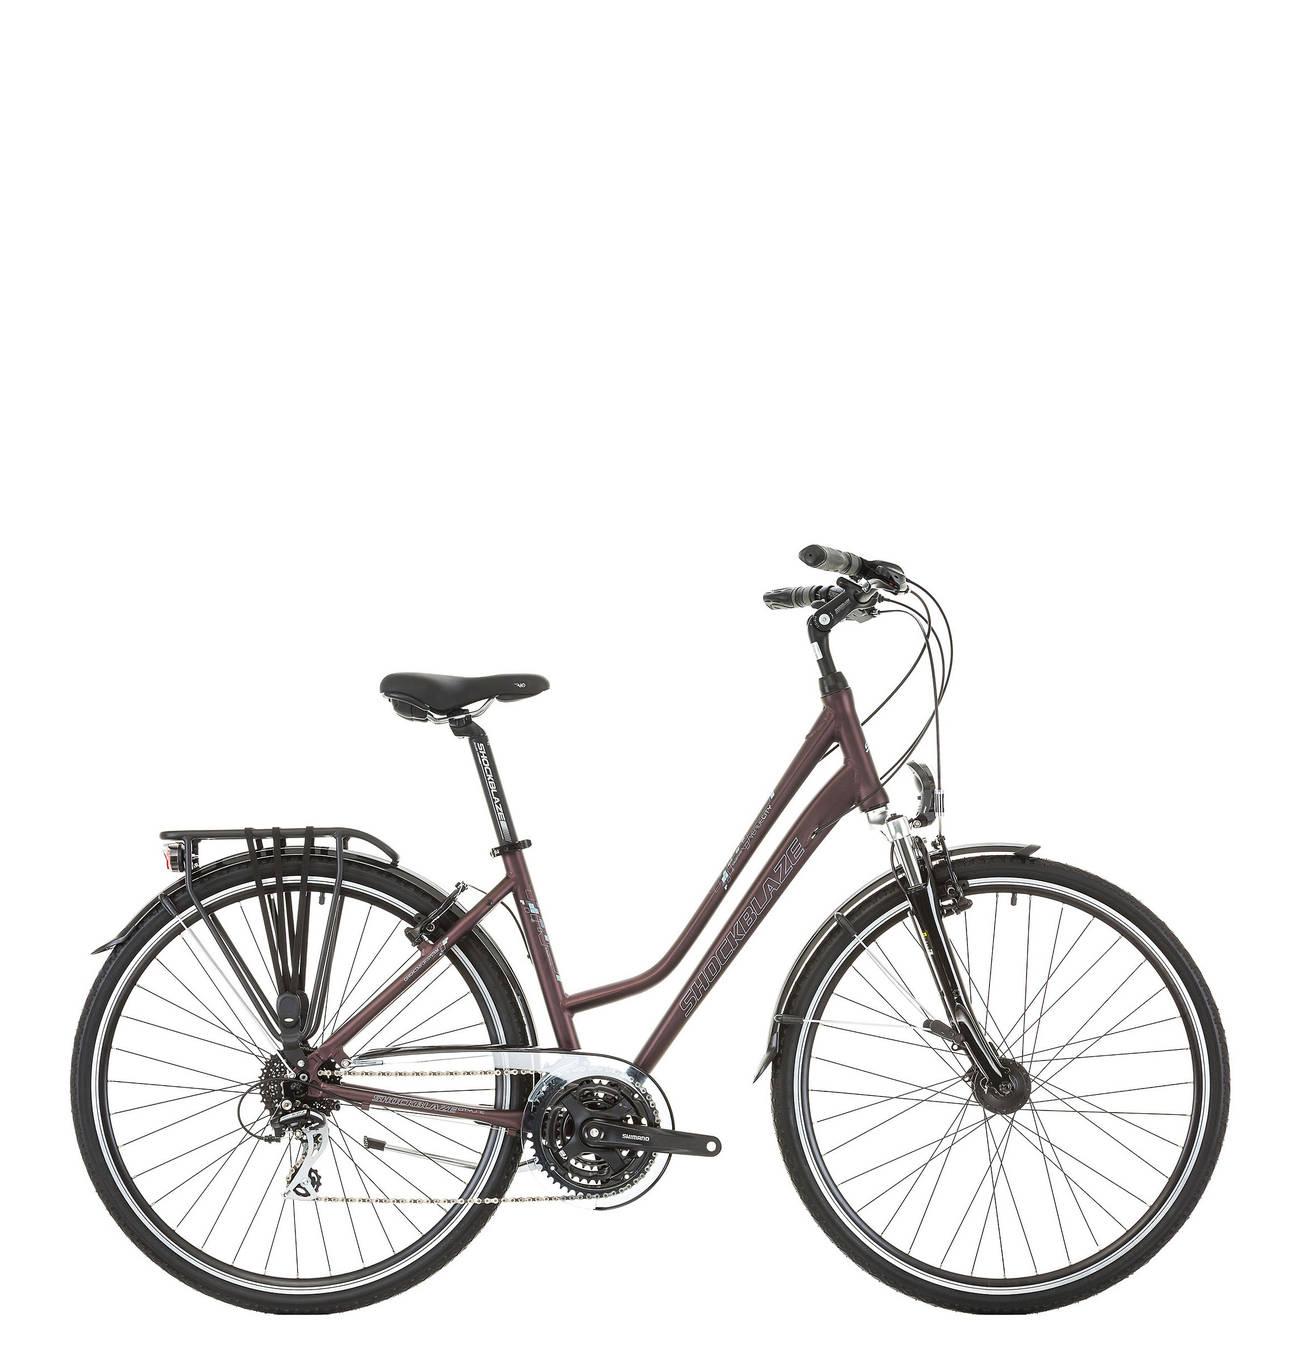 28 Zoll Damen Trekking Fahrrad 24 Gang Schockblaze Venue Trekking Fahrrad Fahrrad Und City Fahrrad